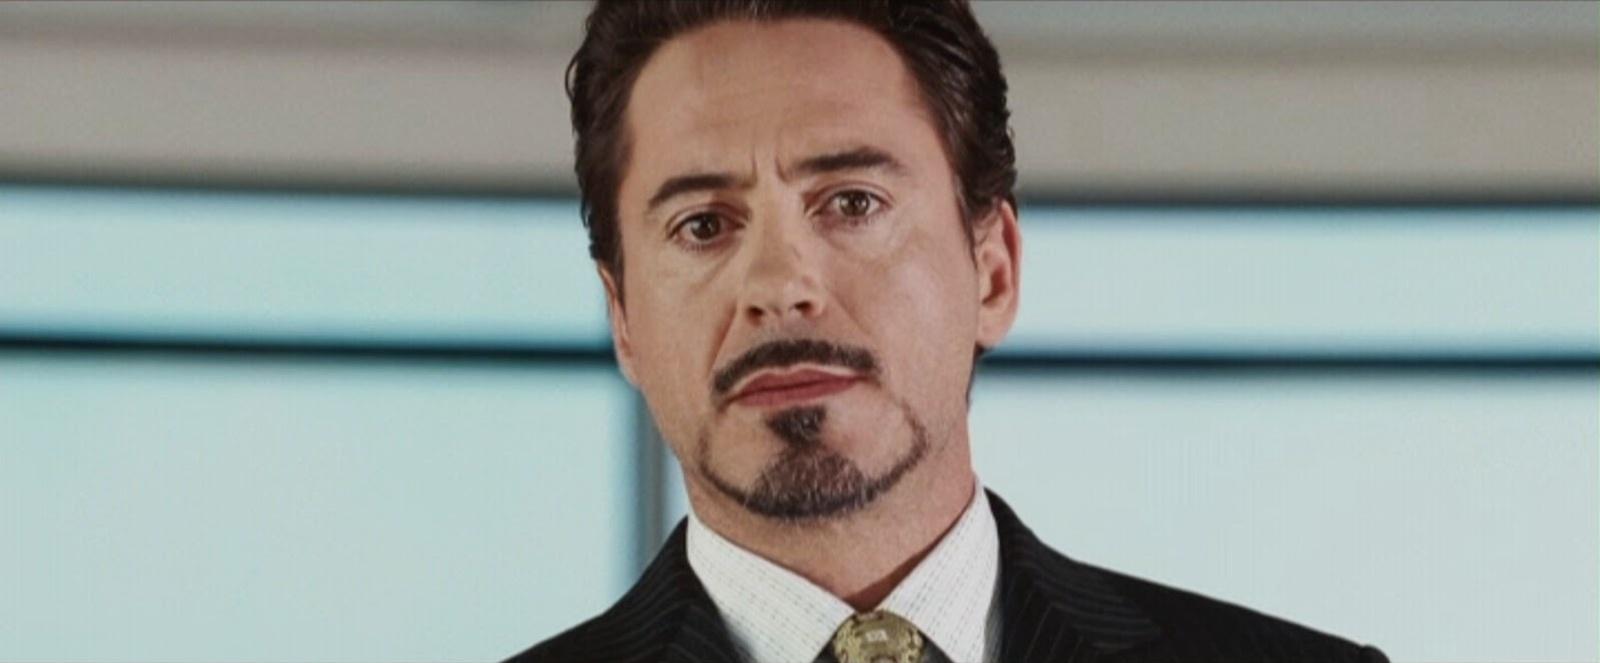 Robert Downey Jr., em cena de